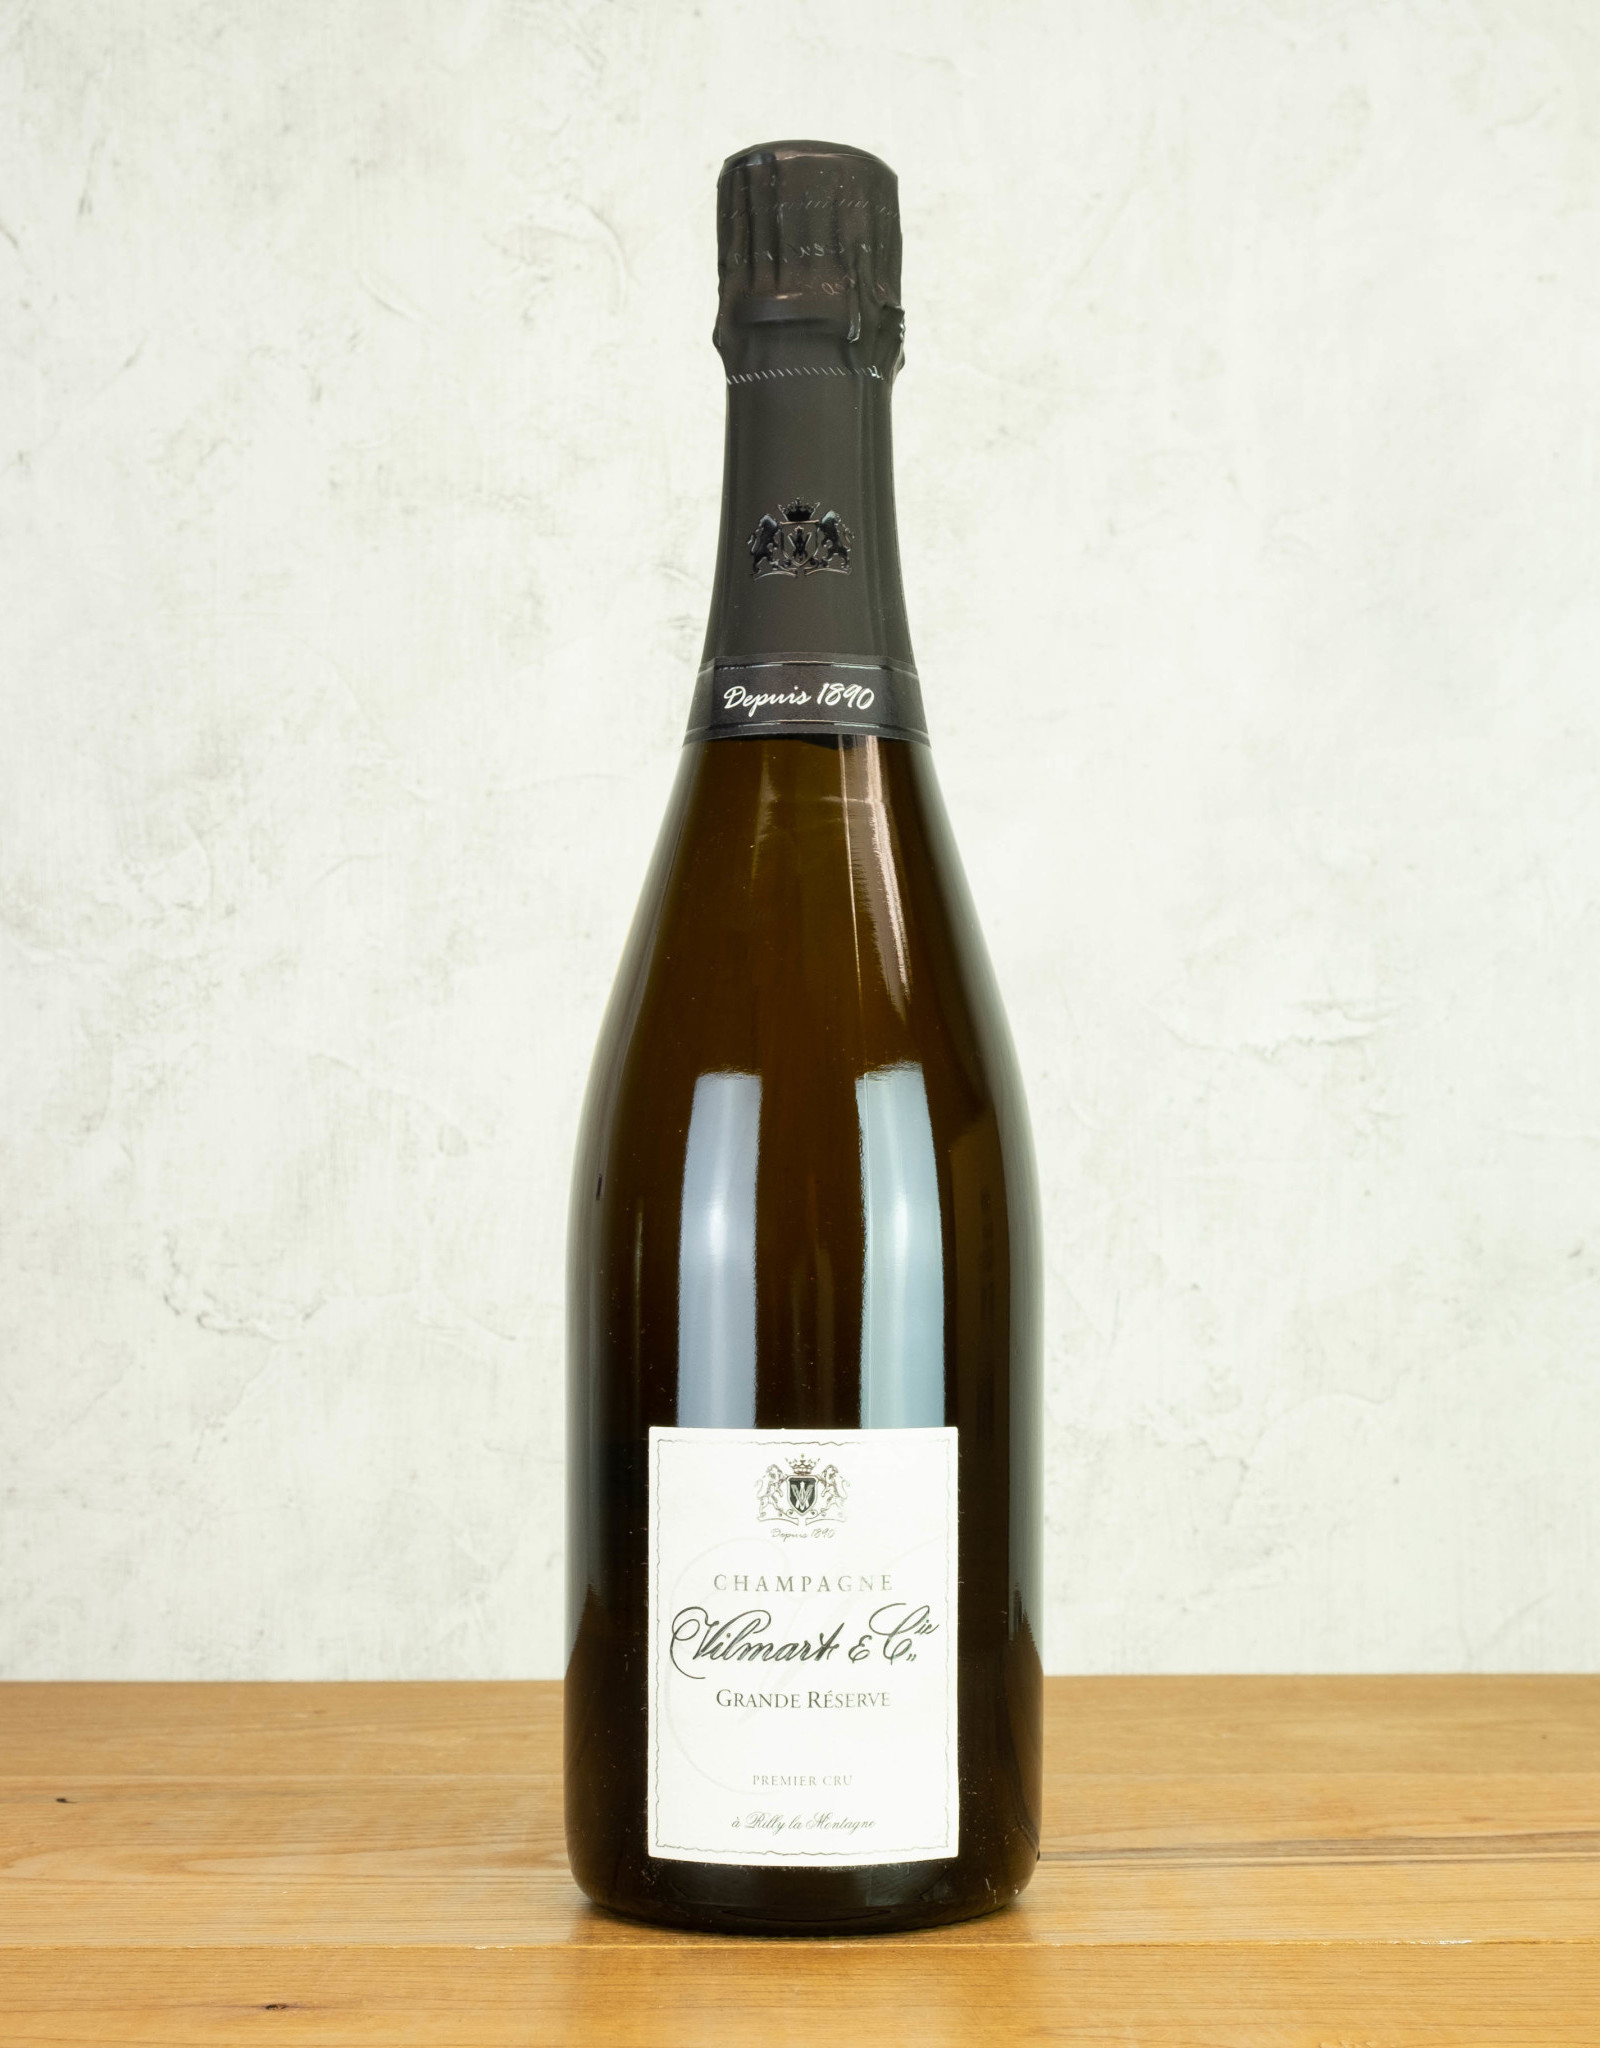 Vilmart et Cie Grand Reserve Premier Cru Champagne